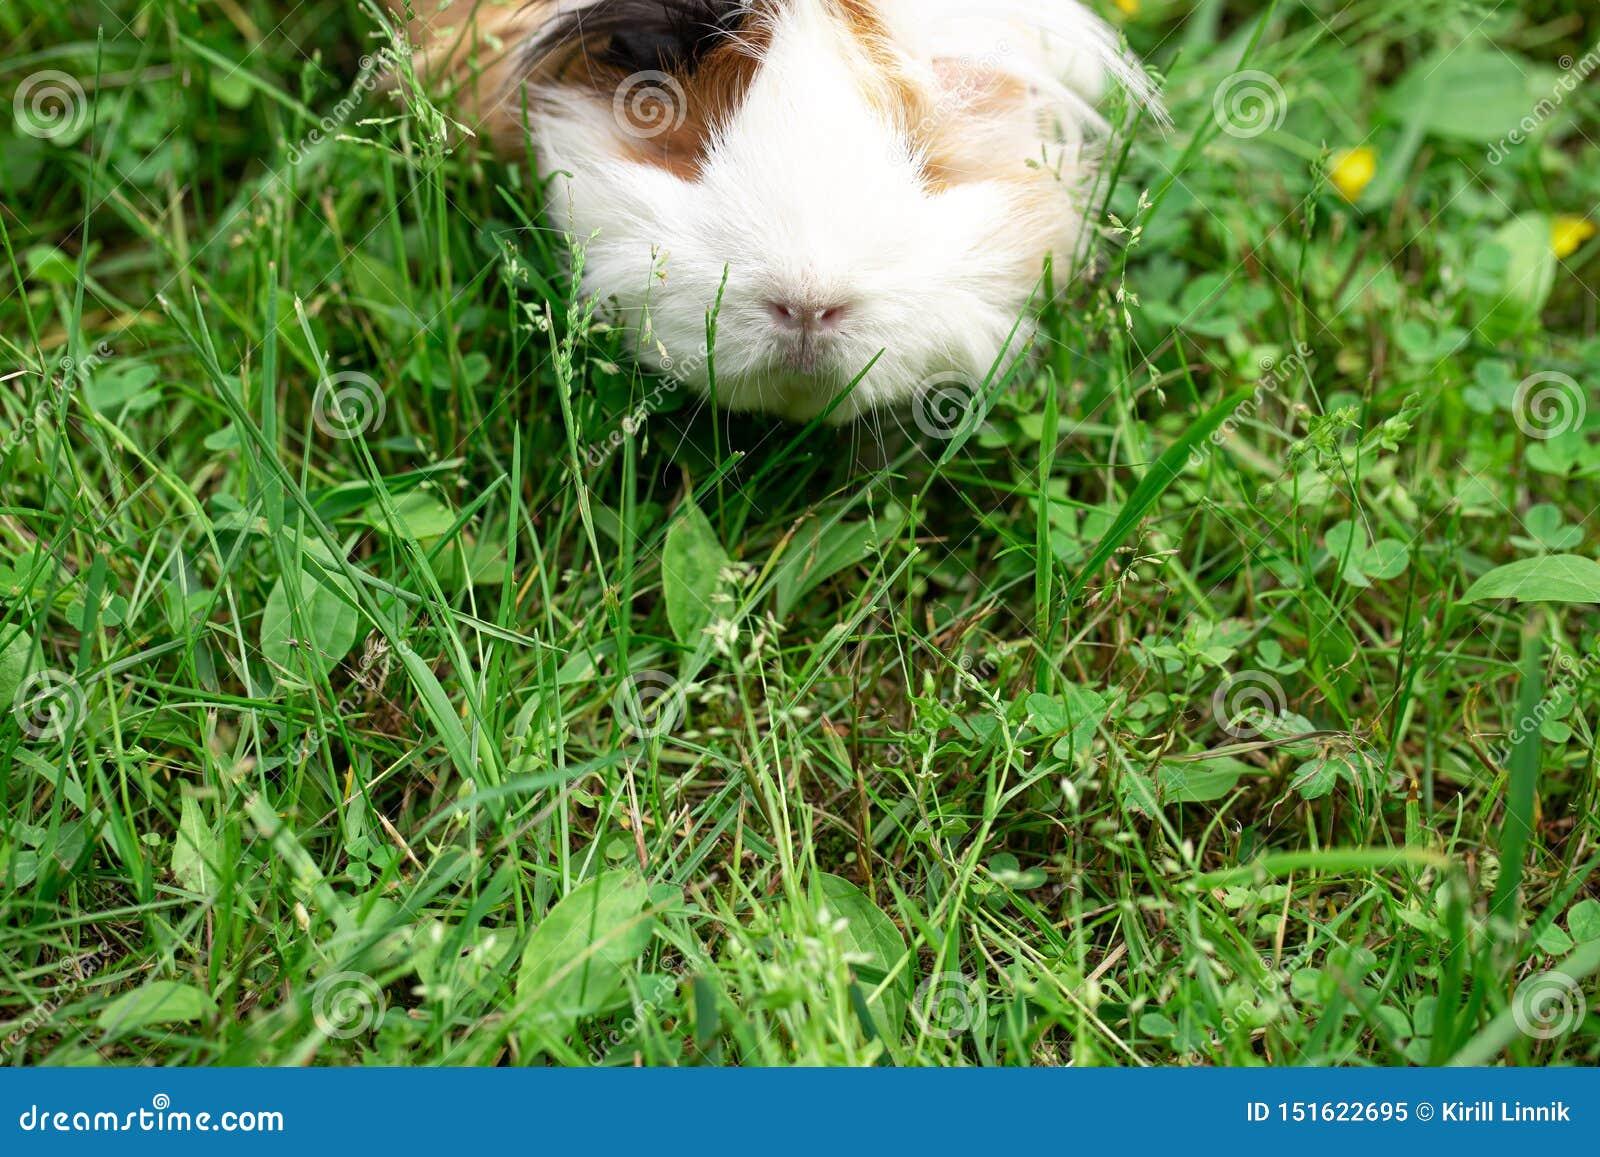 Guinea pig on the grass